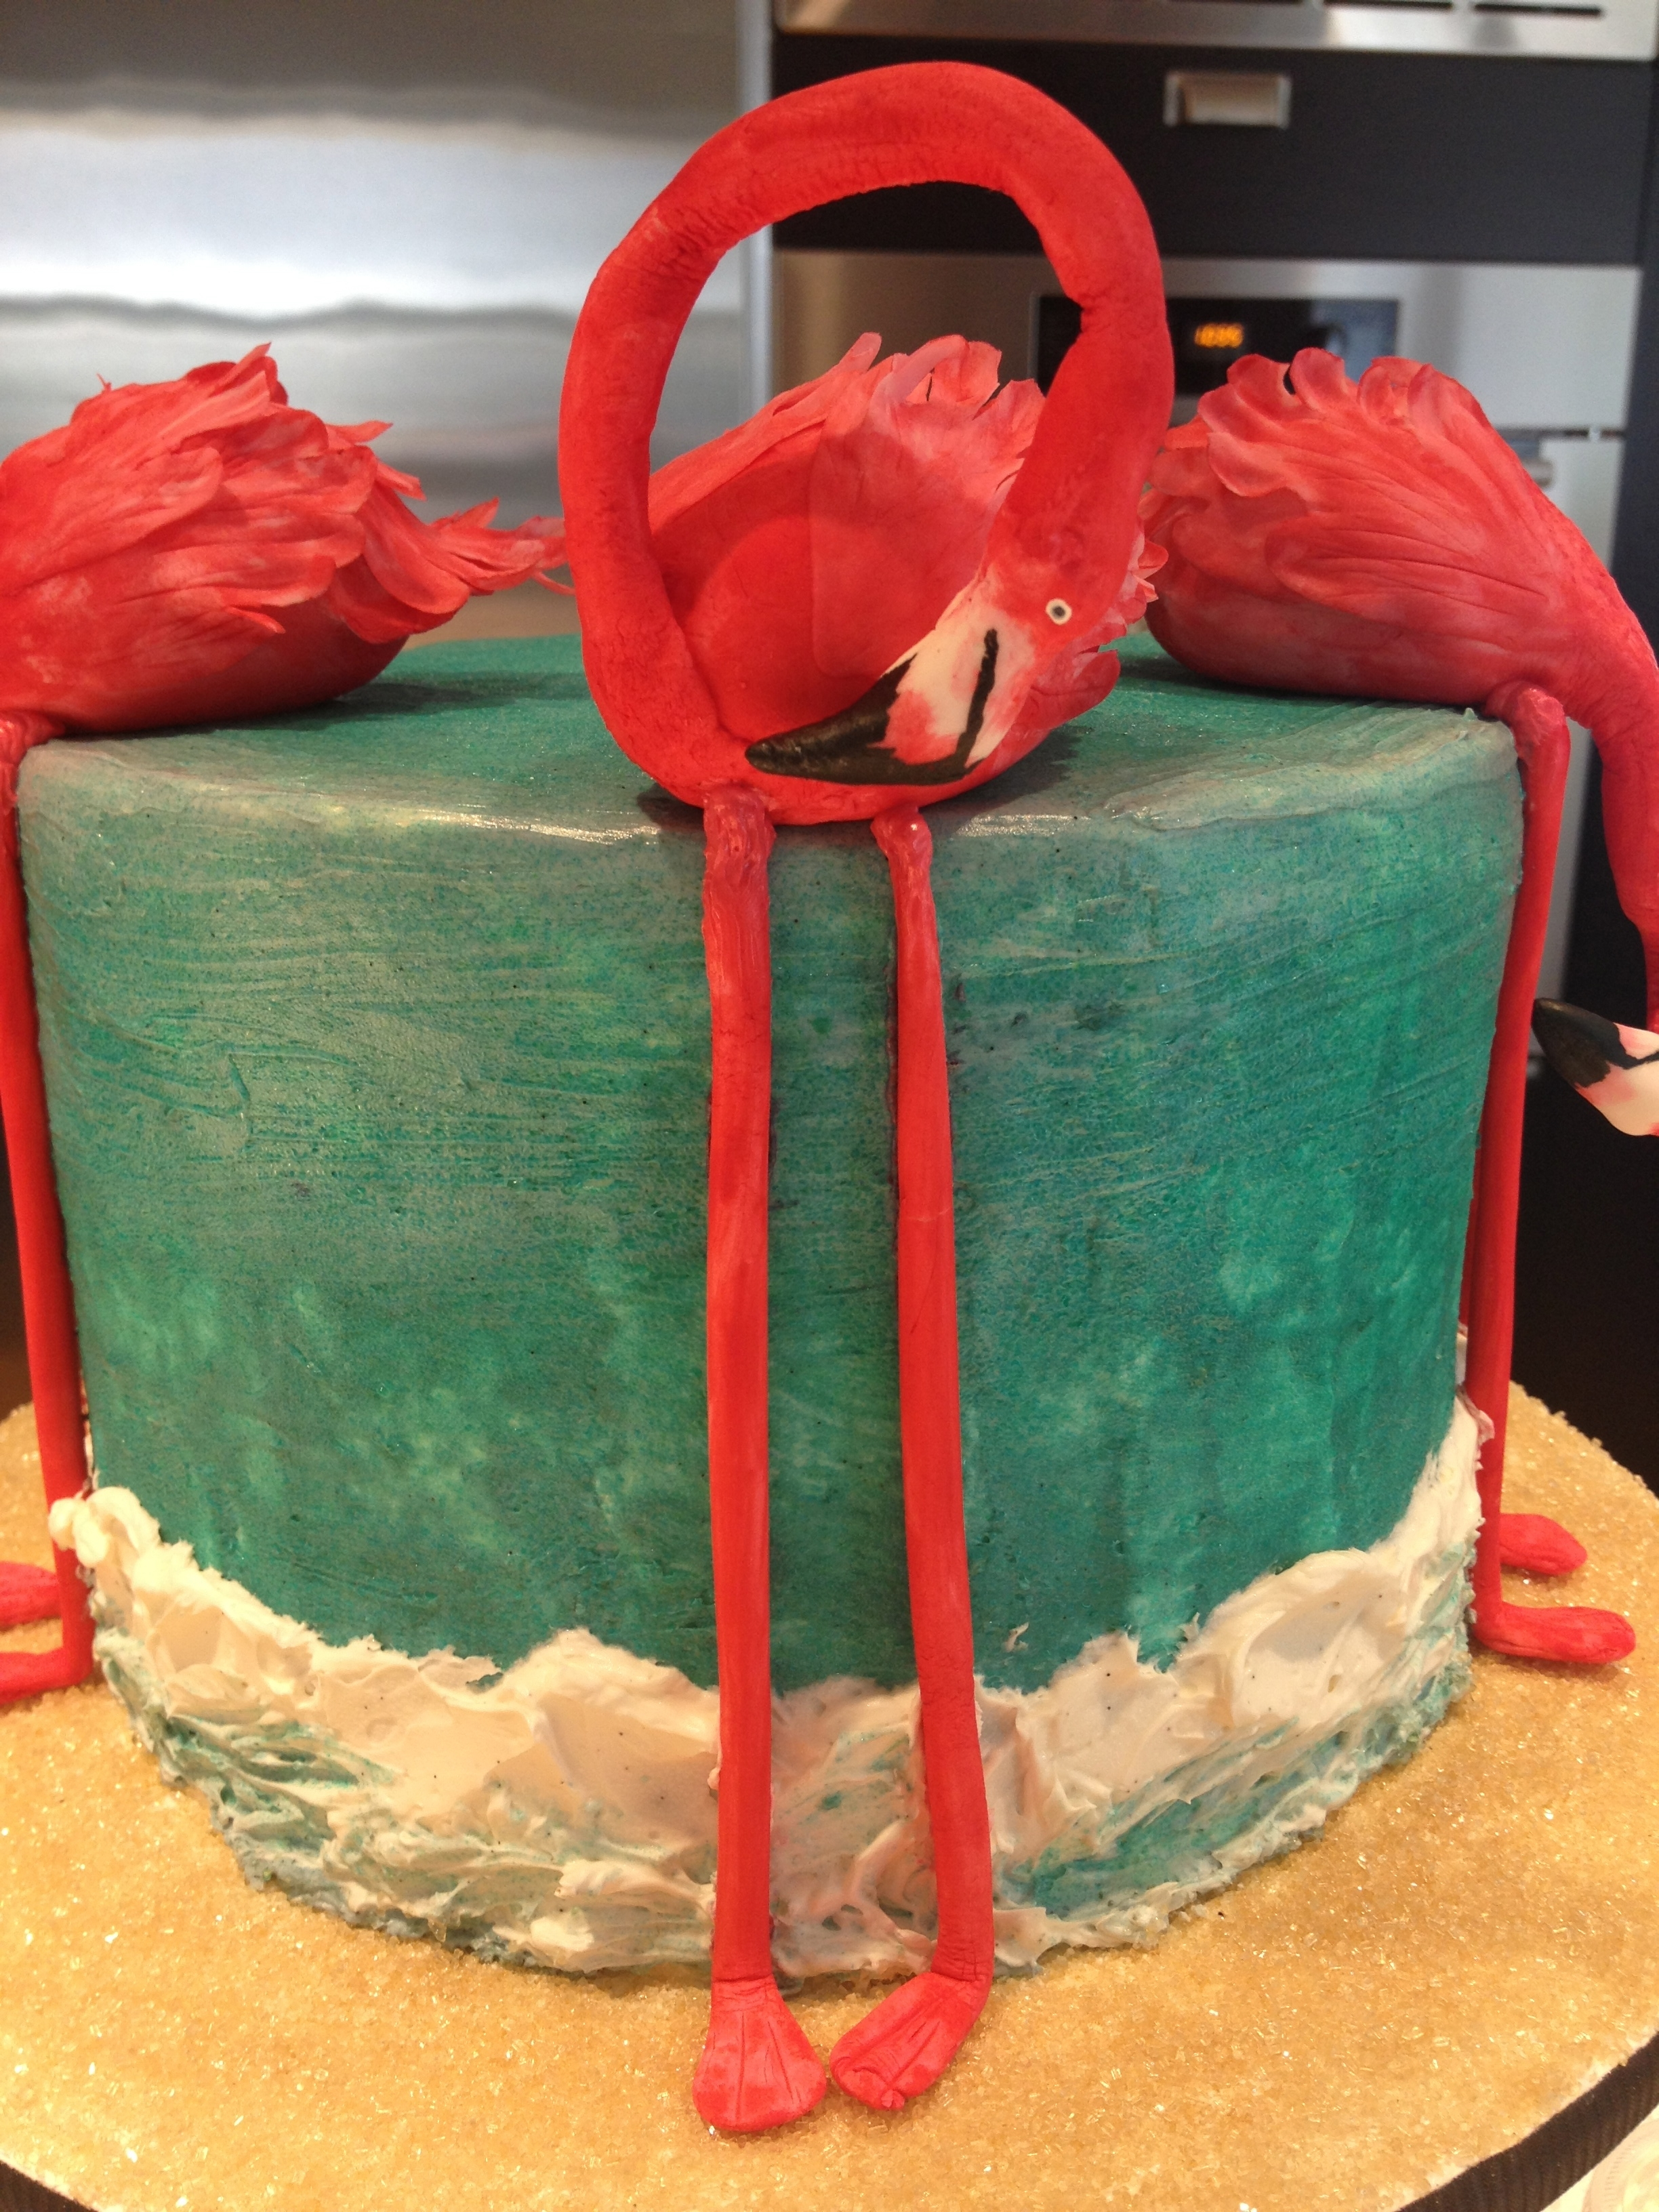 Flamingo Cake The Flamingos Are Made Out Of Gumpaste The